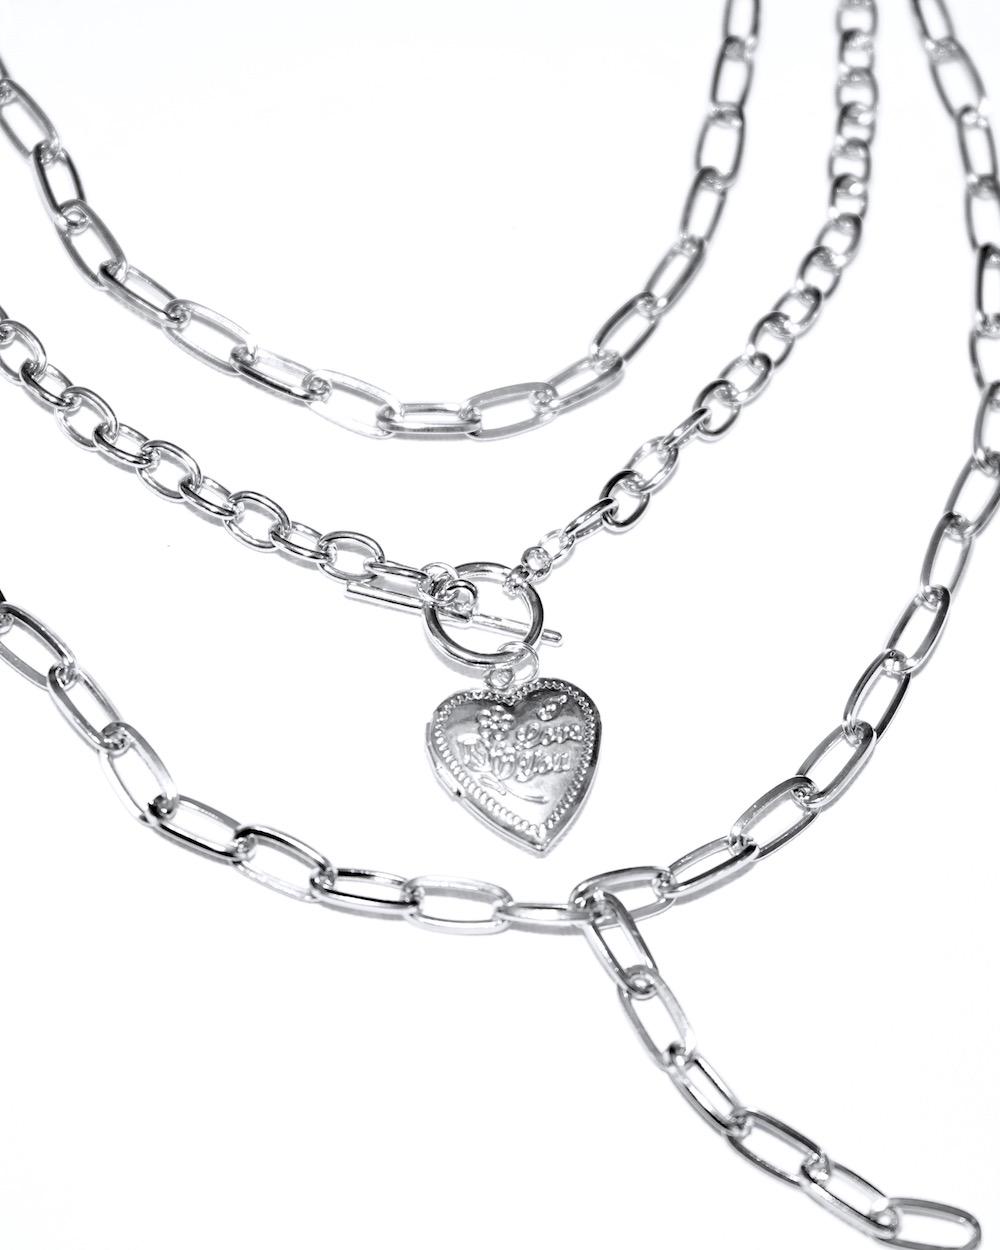 Heart Locket Triplicate Silver Chain Necklace